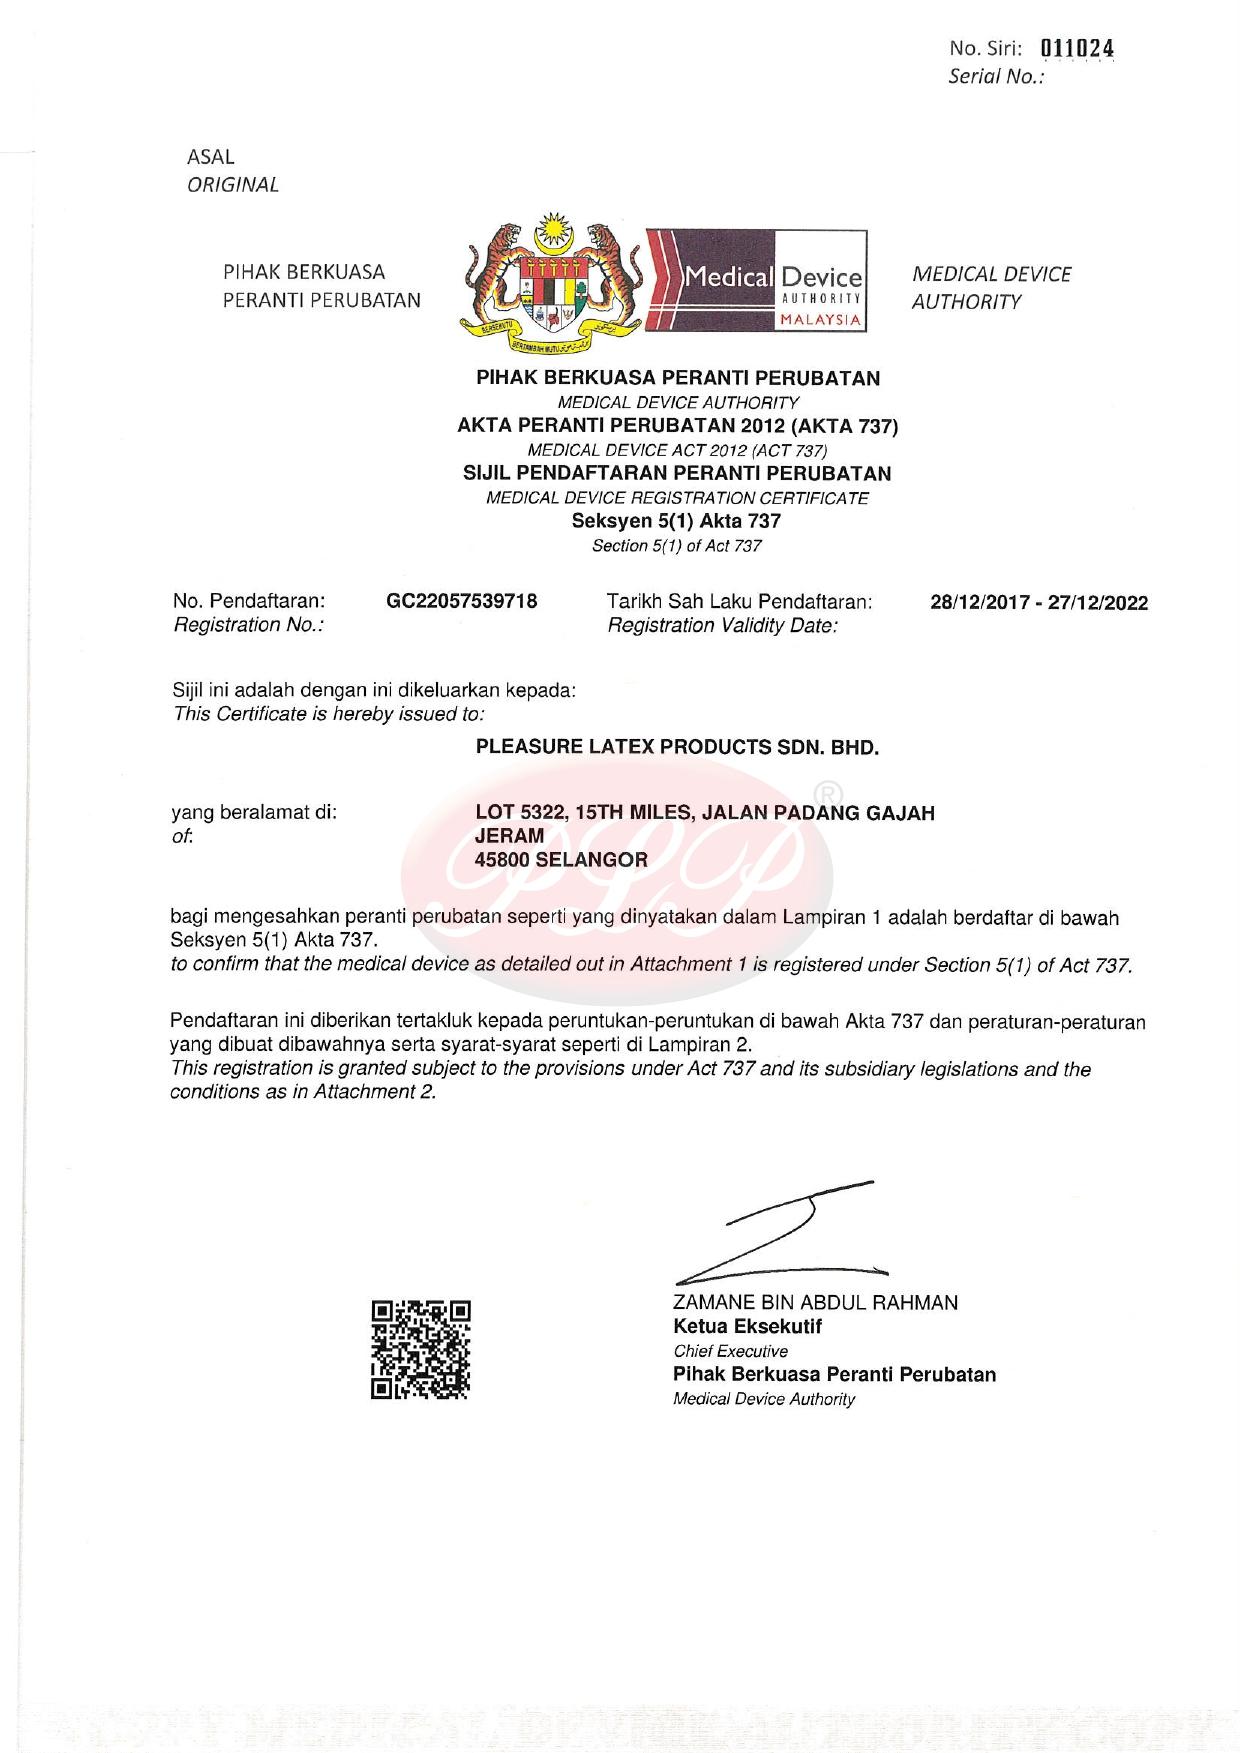 Malaysia MDA Registration Certificate - Kingdom Brand